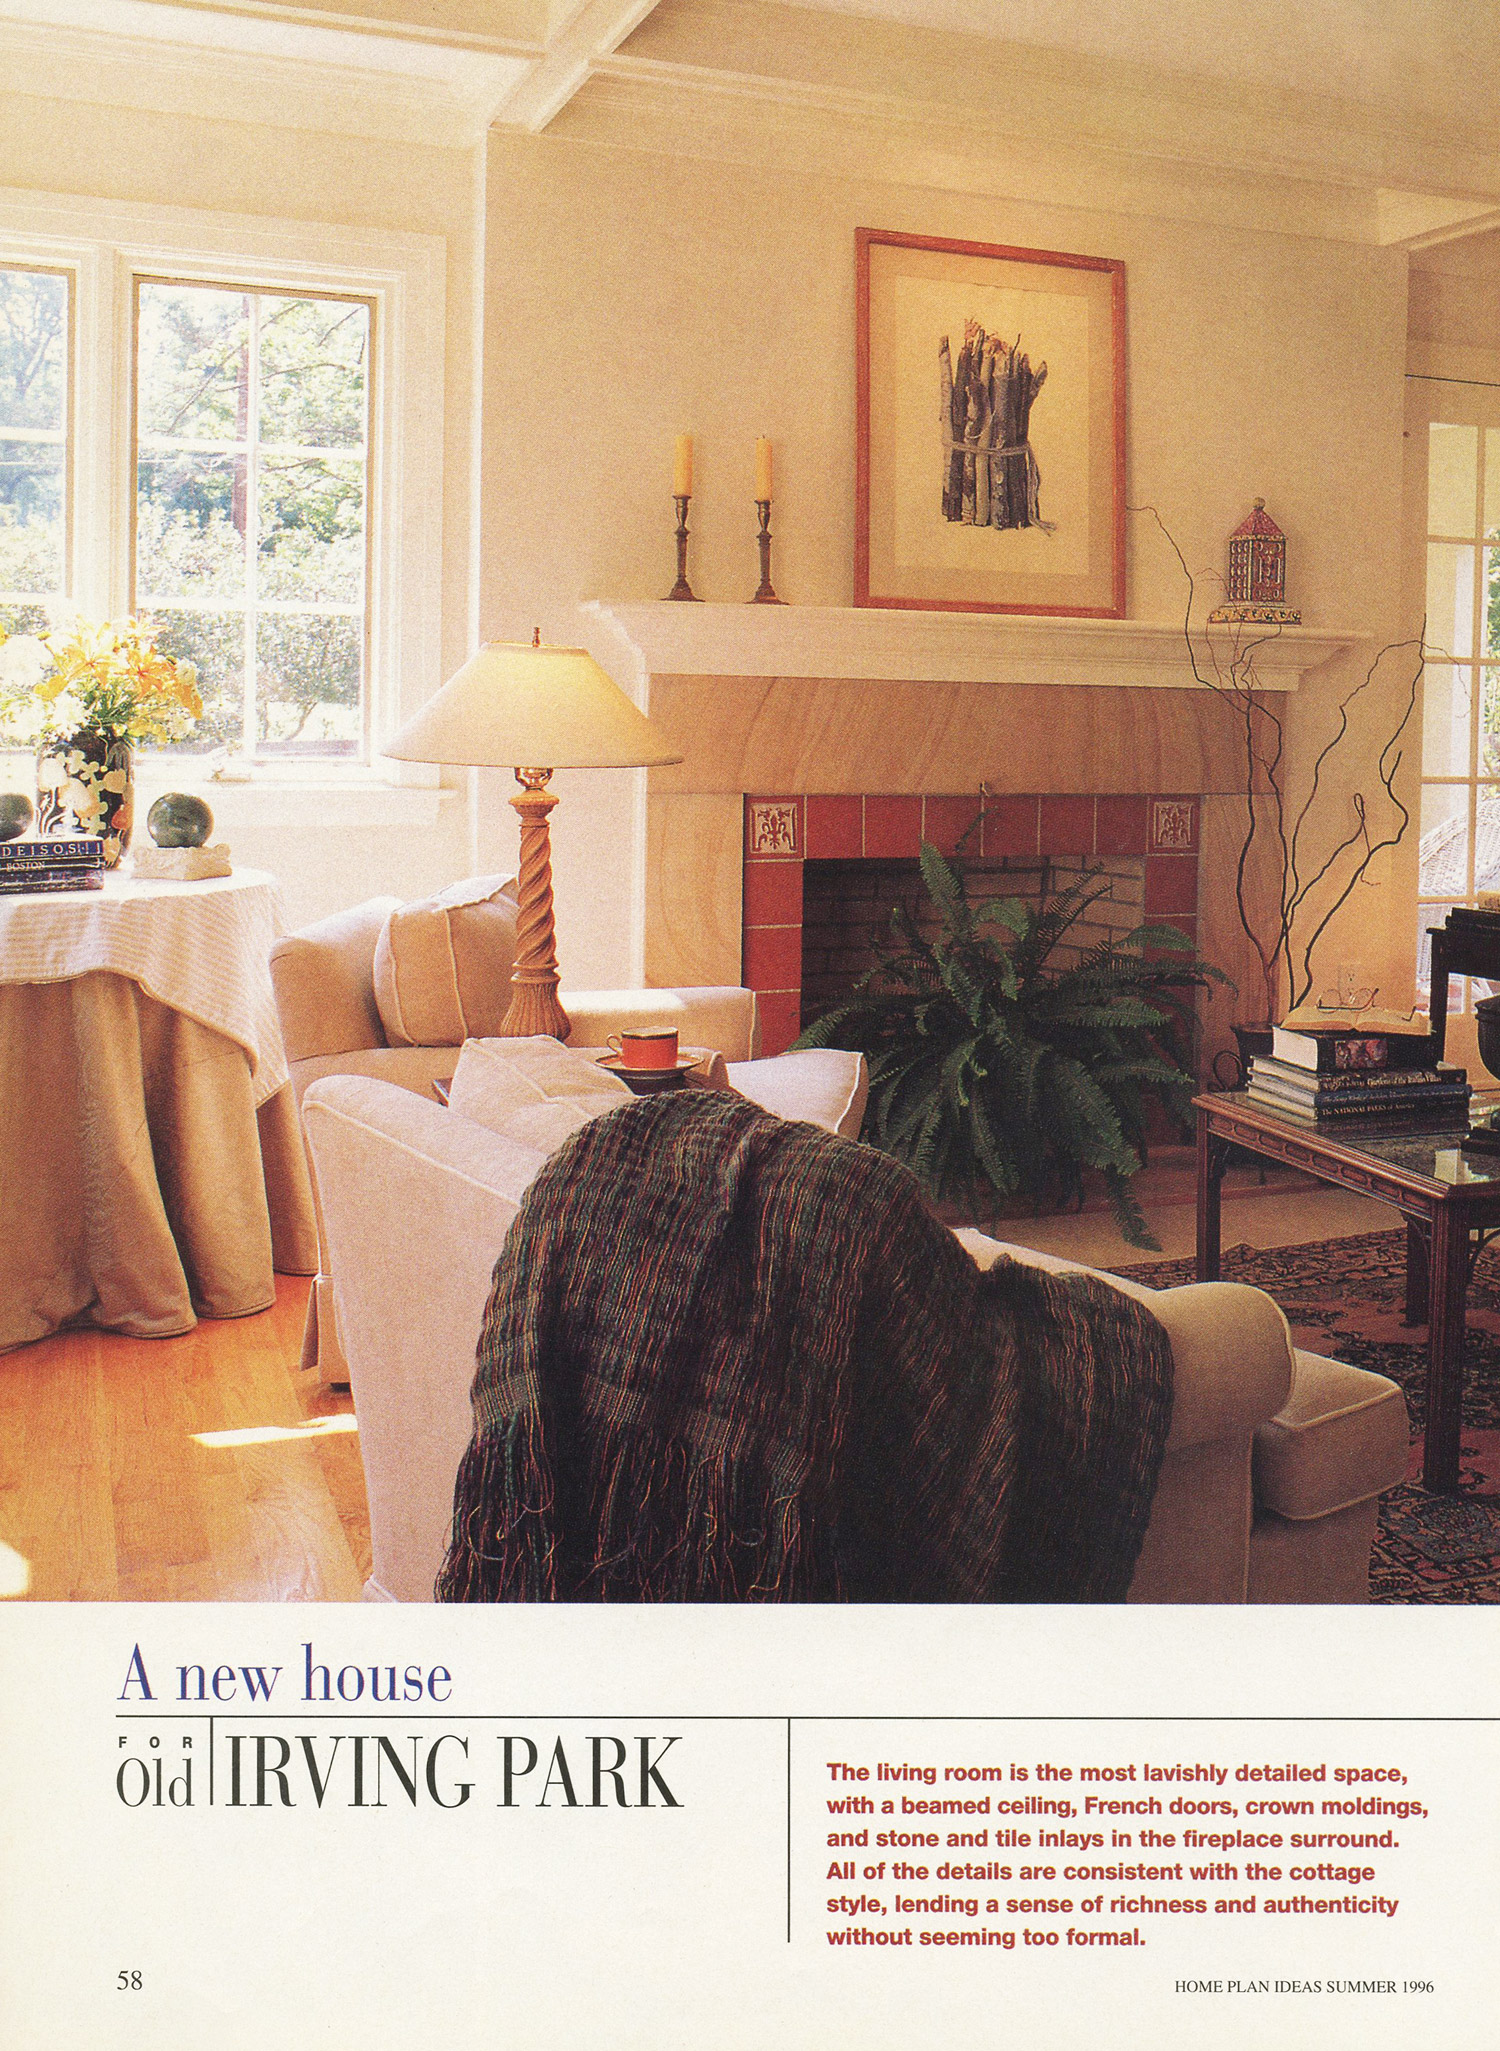 home-plan-ideas-summer-1996-frank-cheney-architect-3.jpg